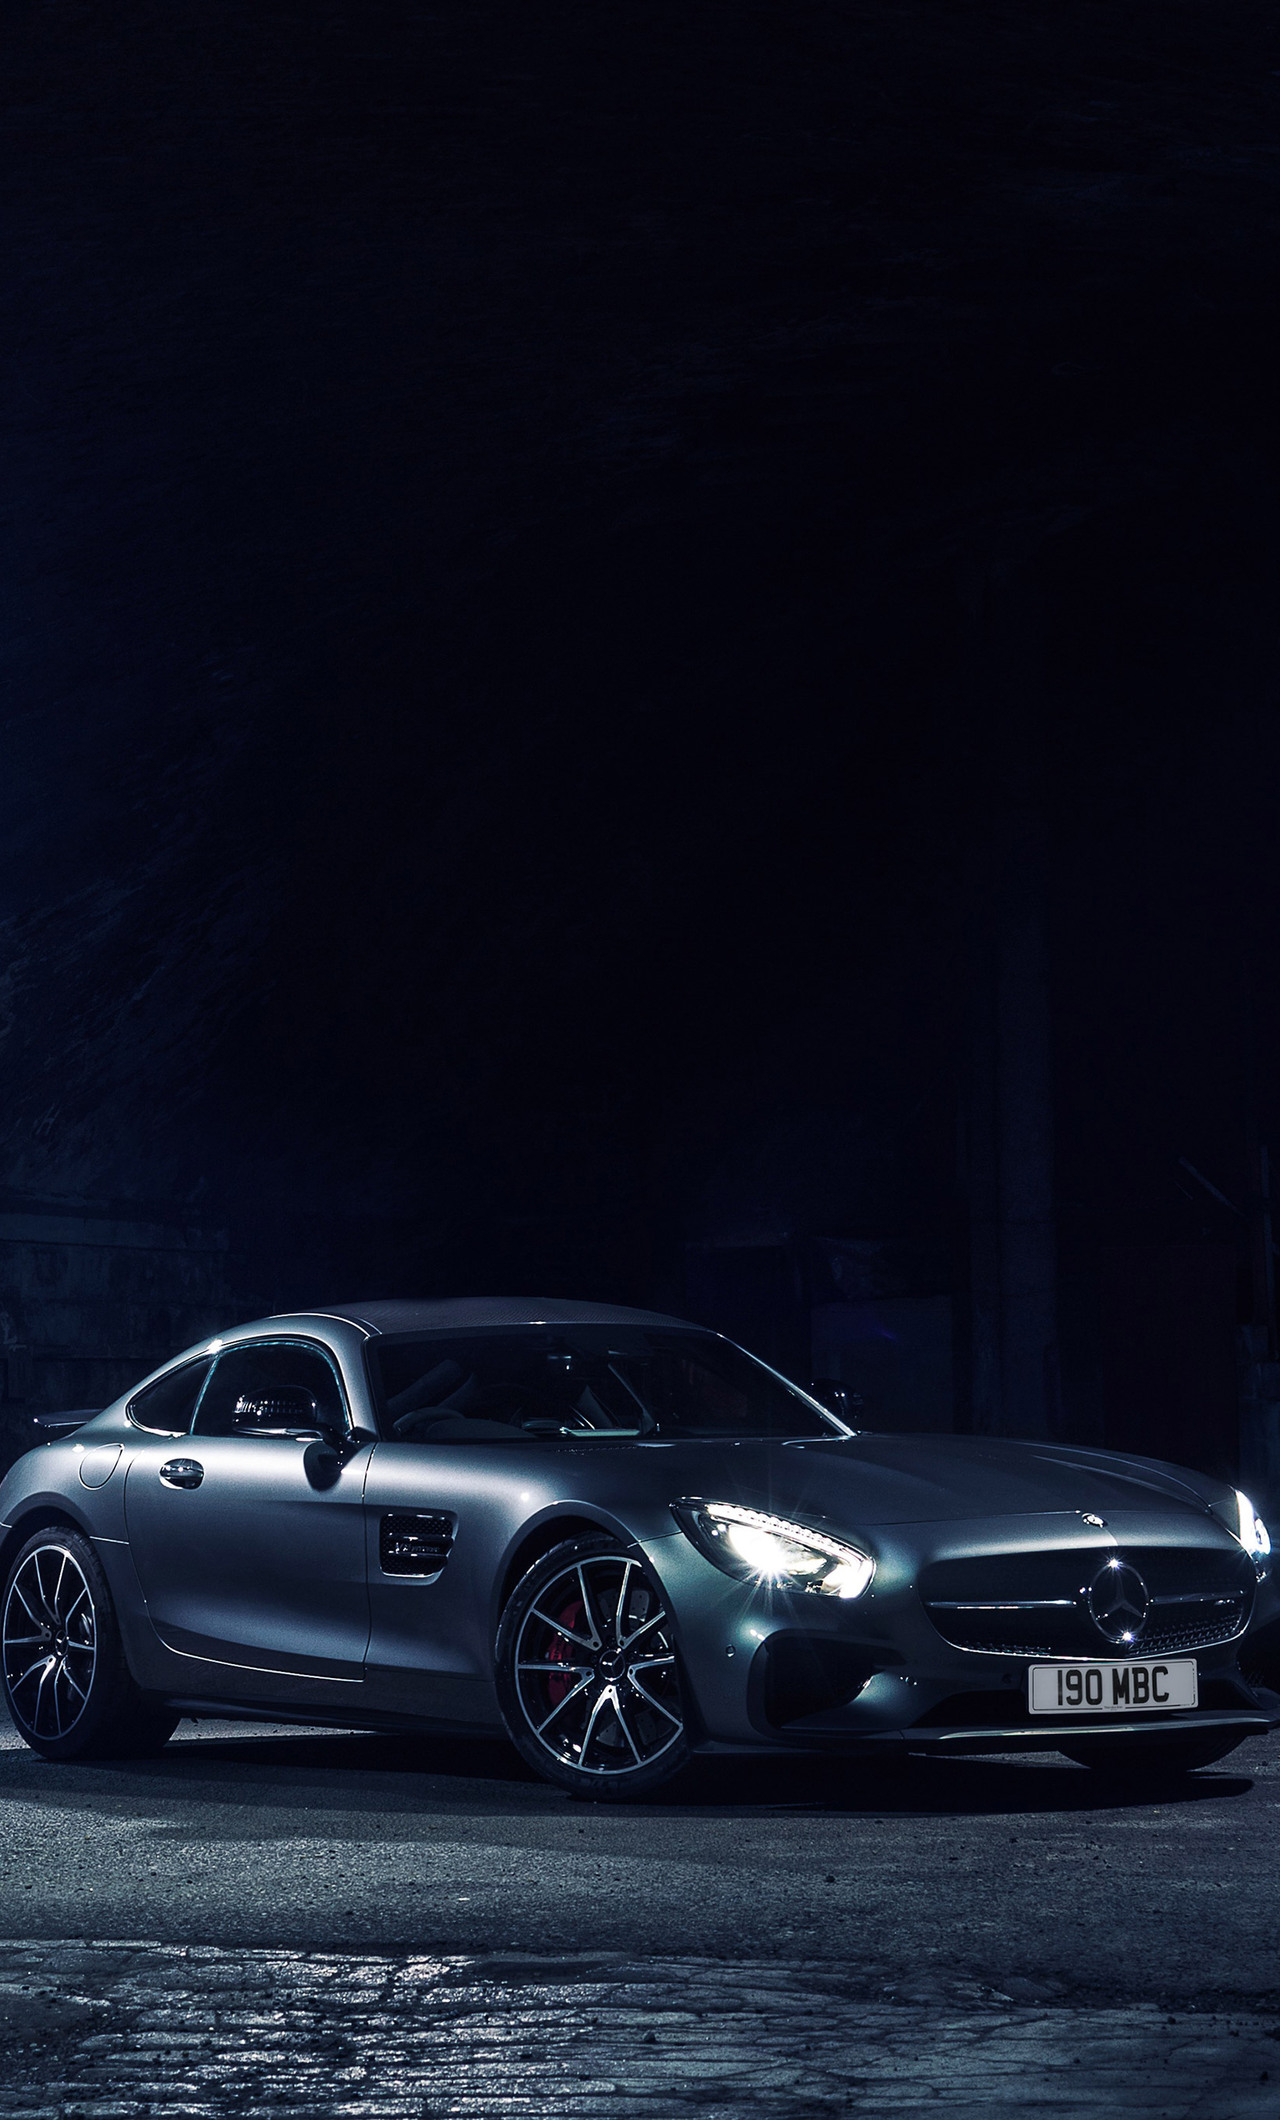 Mercedes Benz Amg Wallpaper Iphone Amazing Wallpaper Hd Library